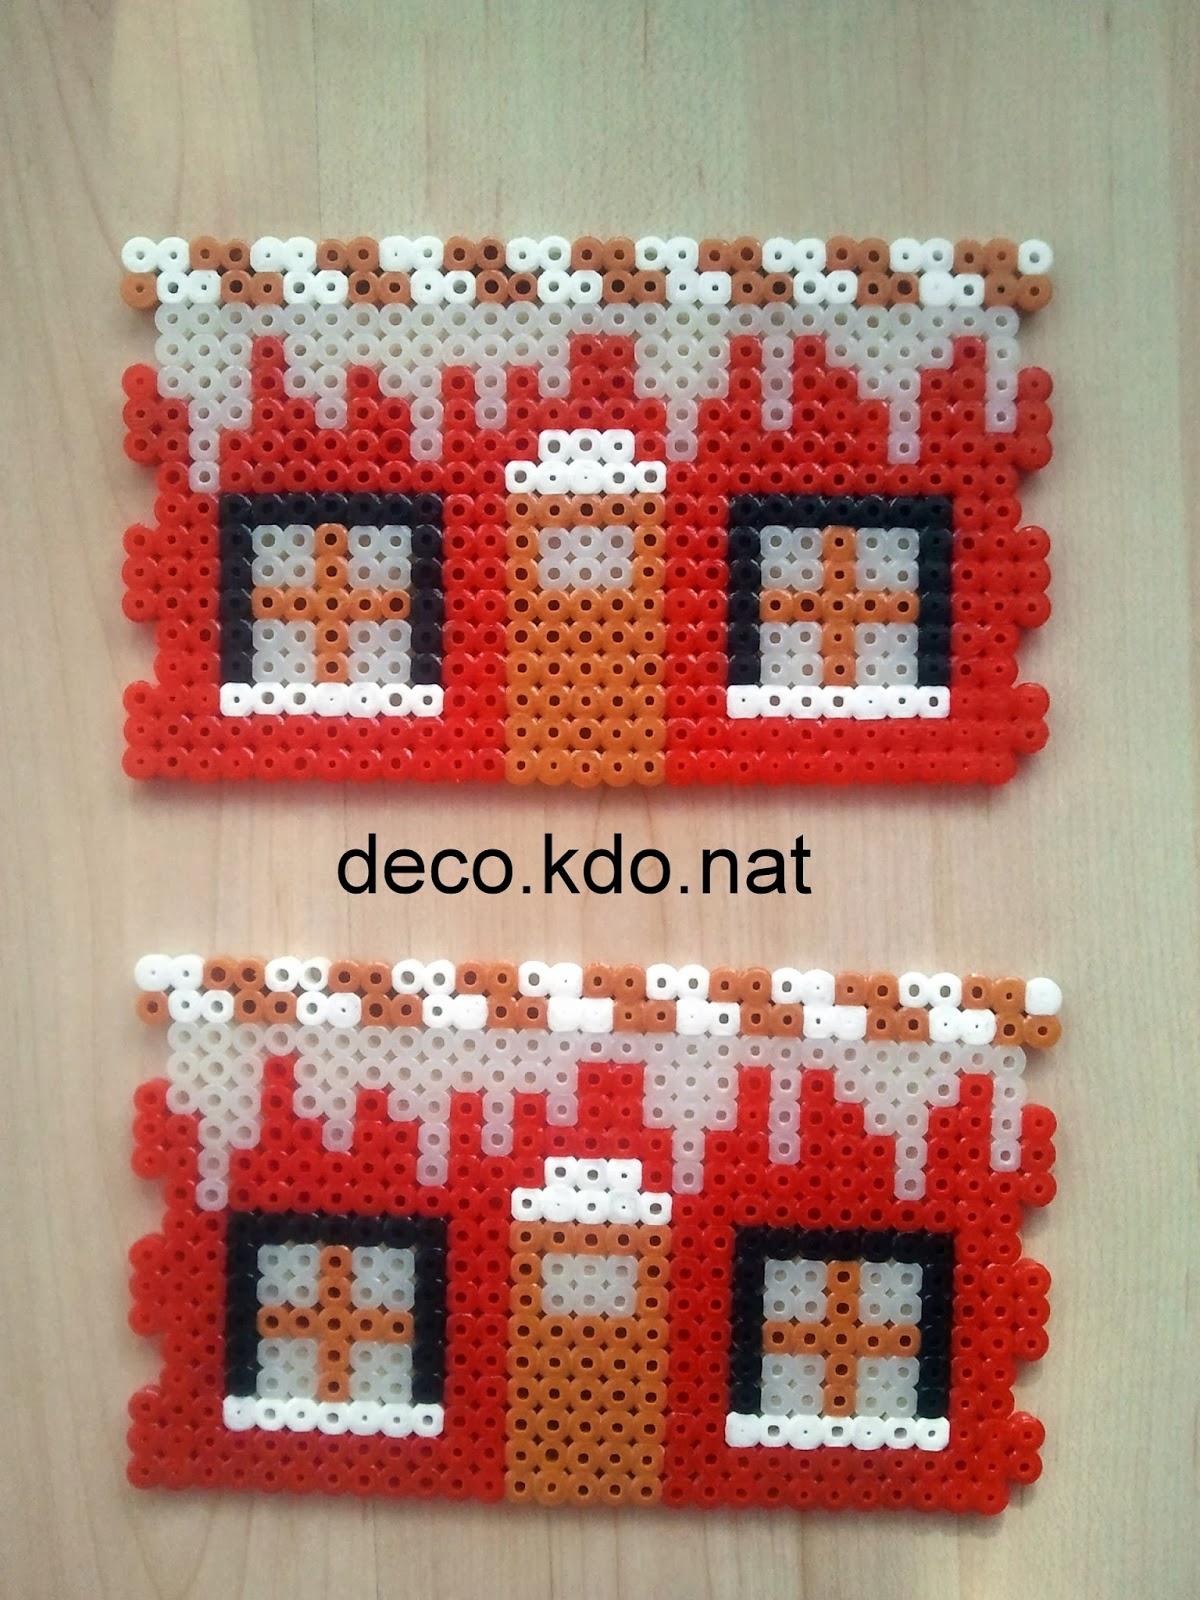 deco kdo nat perles hama maison du p re no l 3d. Black Bedroom Furniture Sets. Home Design Ideas